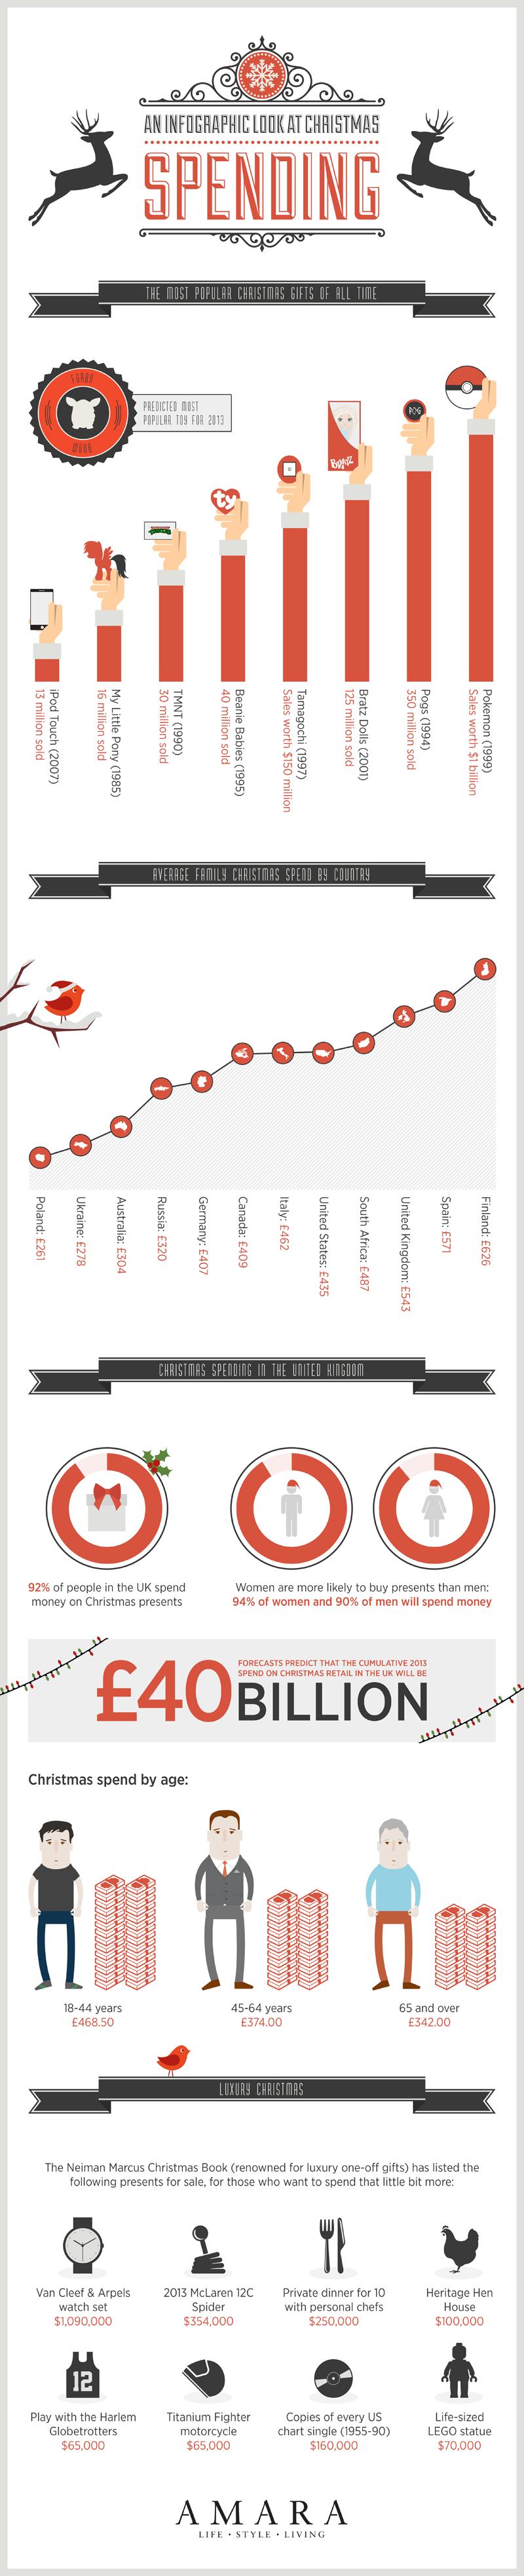 Amara Christmas Spending Infographic